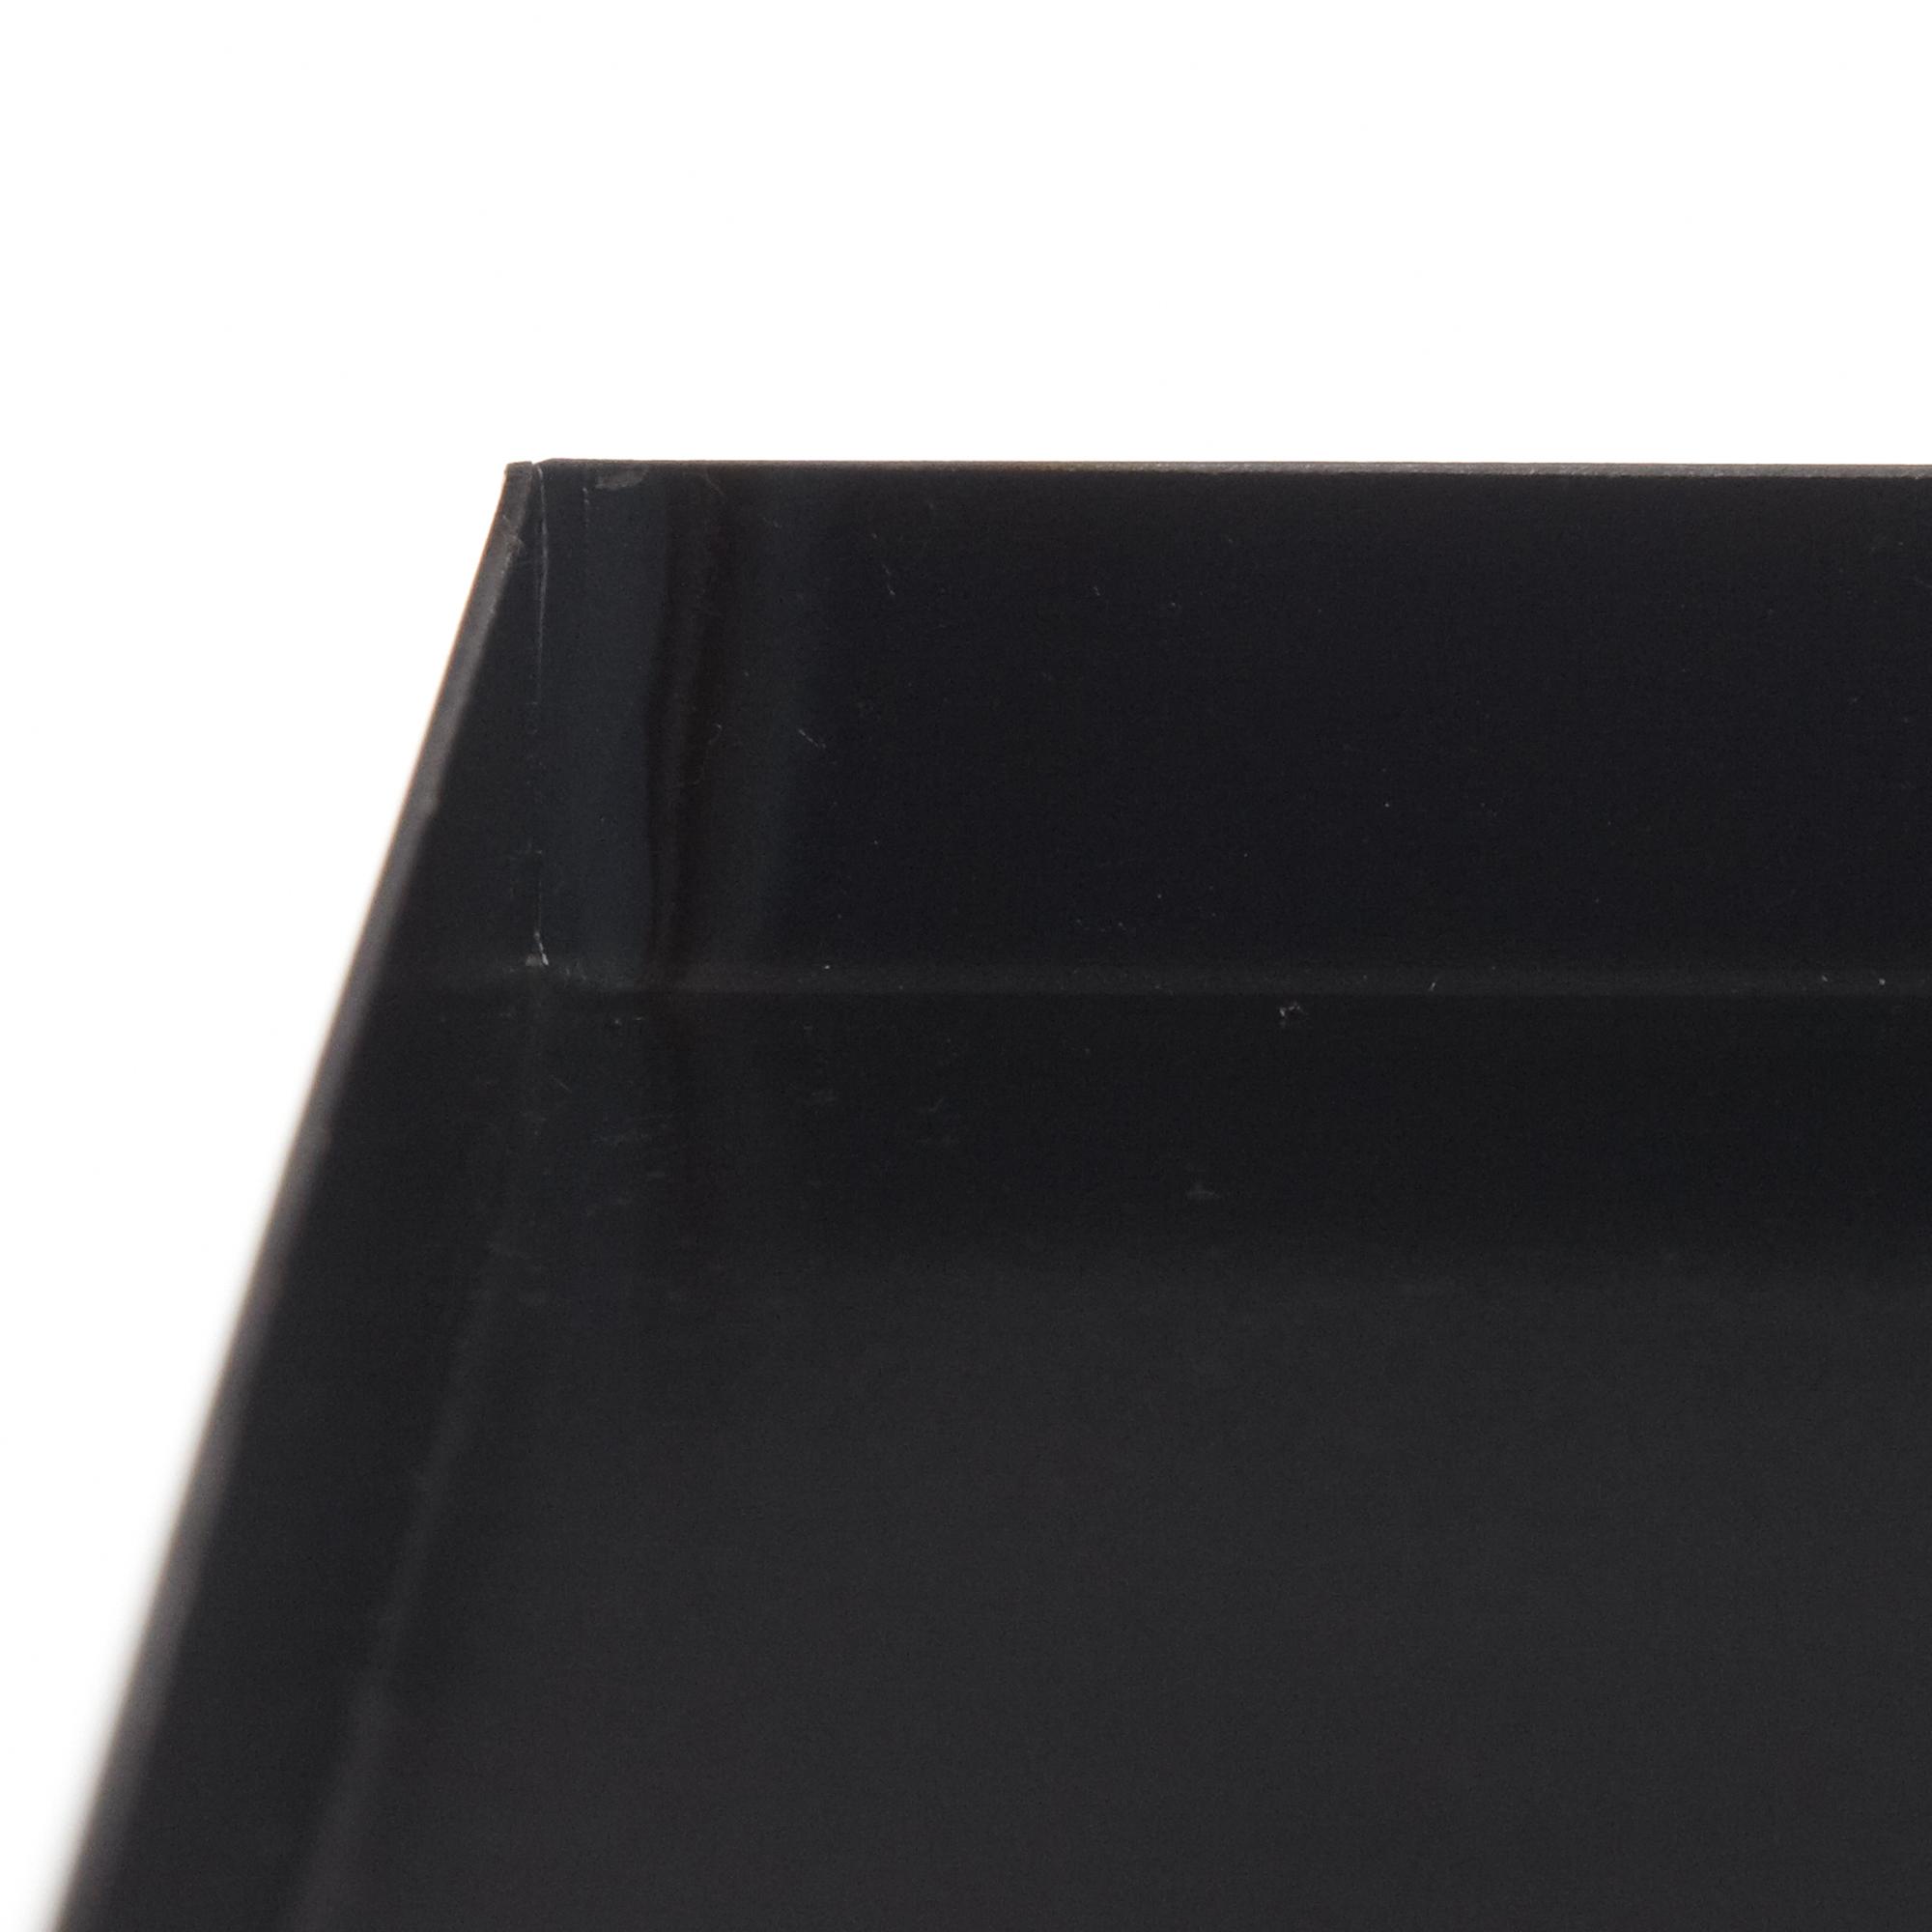 plaque en t le d 39 acier 600x400 mm bords droits mjpro. Black Bedroom Furniture Sets. Home Design Ideas